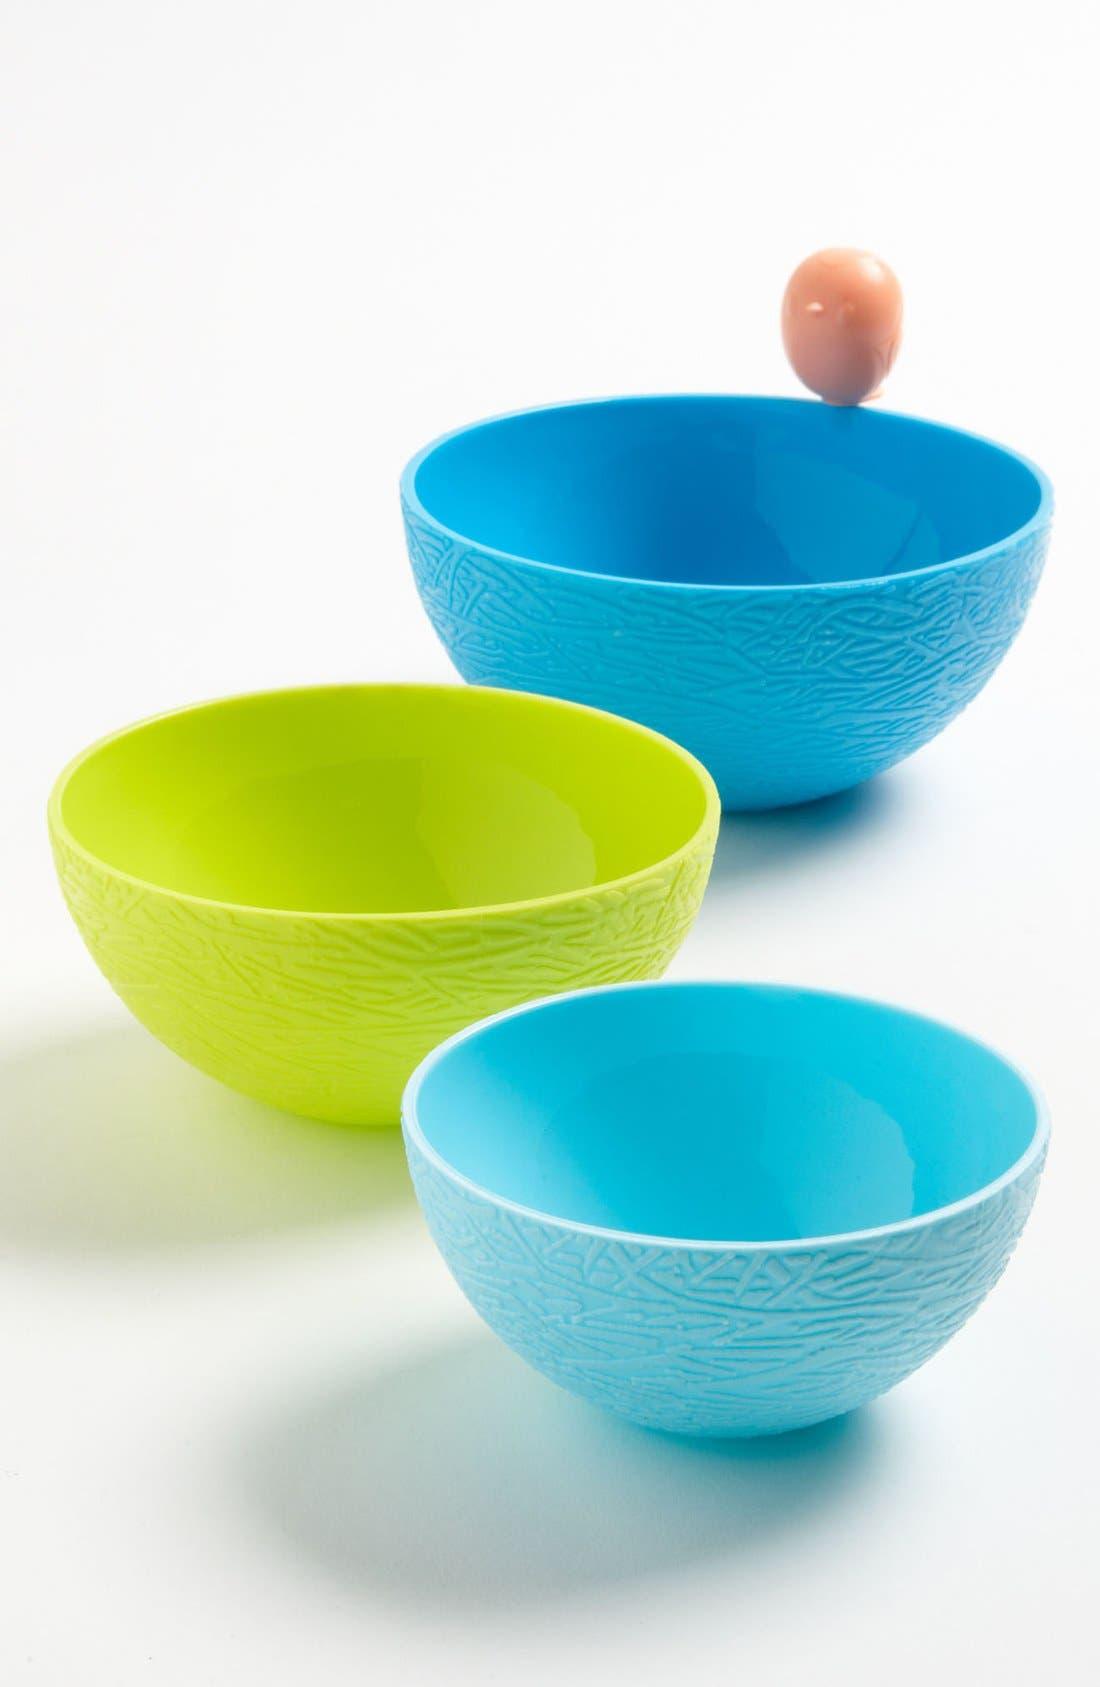 Alternate Image 1 Selected - Nesting Bowls (Set of 3)